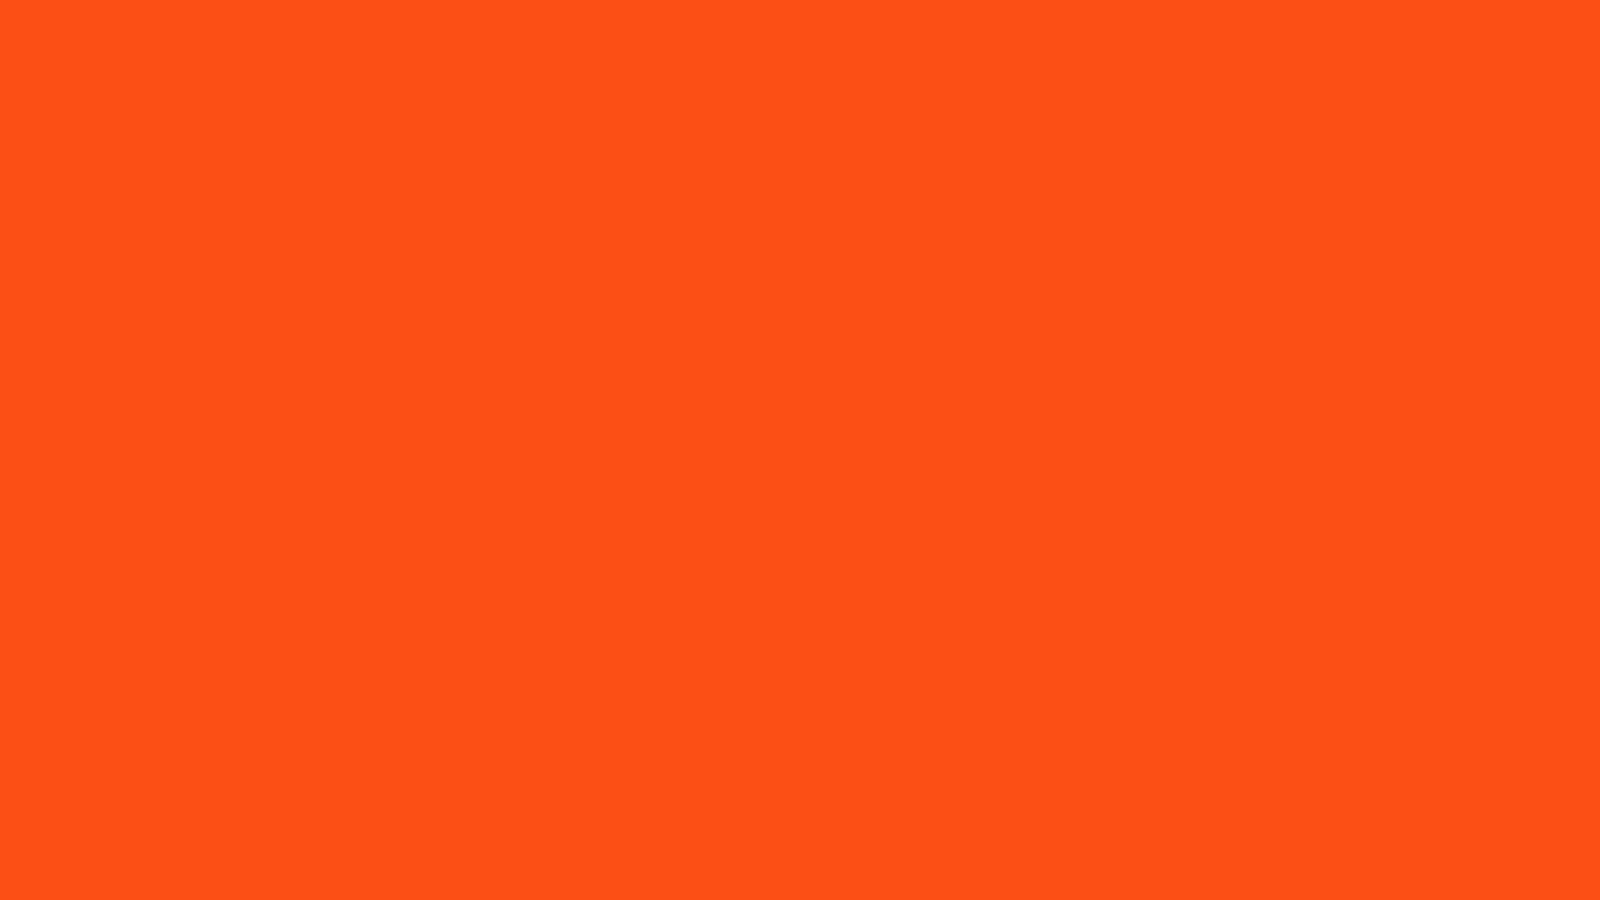 1600x900 orioles orange solid color background